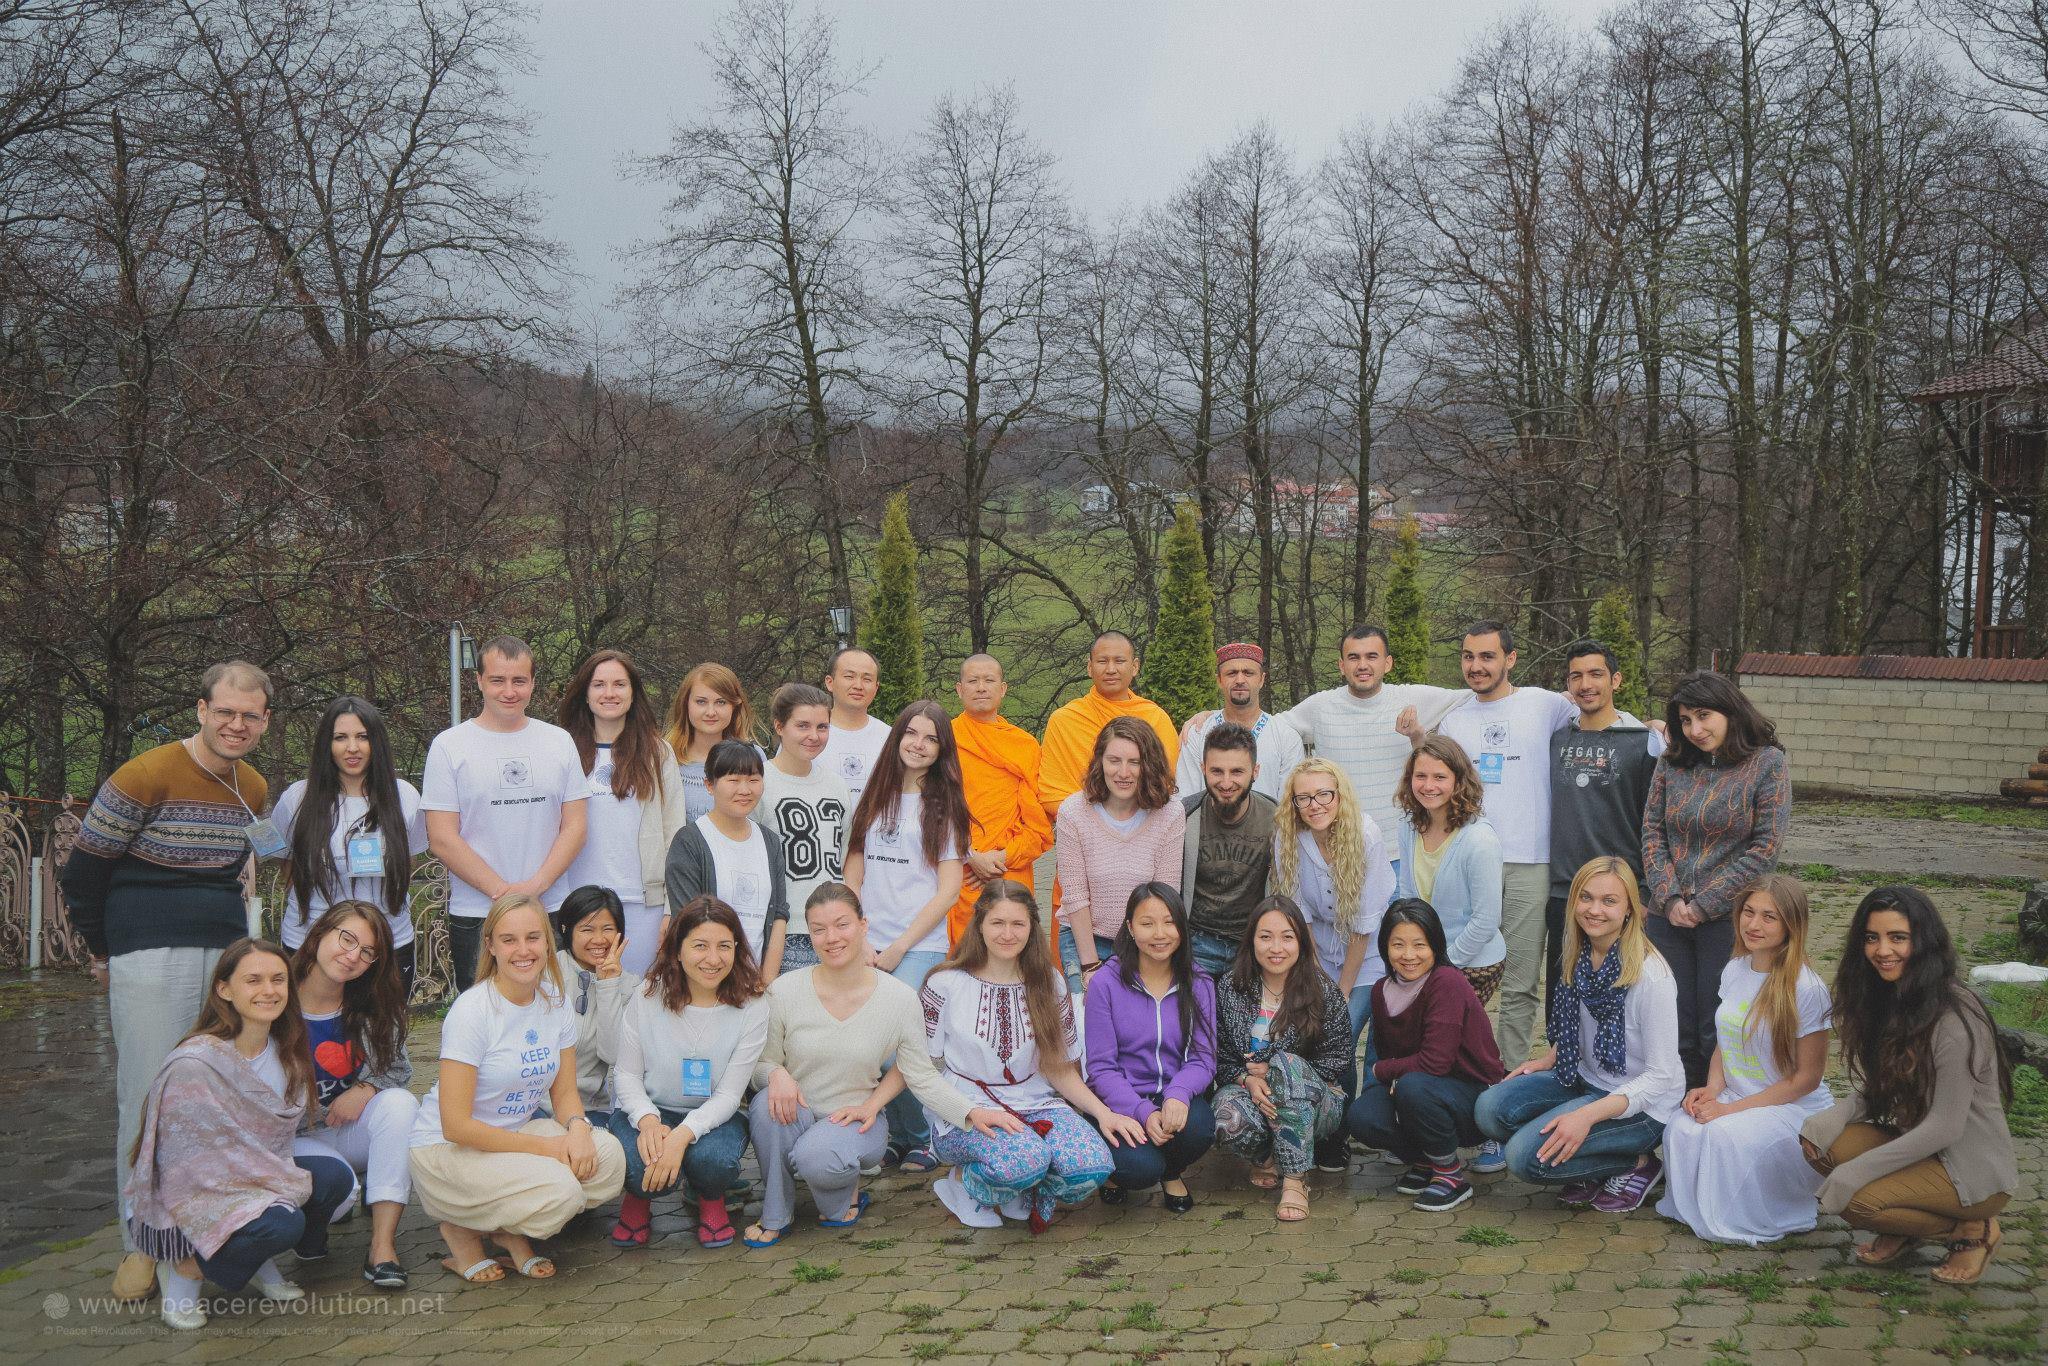 Peace Revolution BRIDGE Peace Fellowship